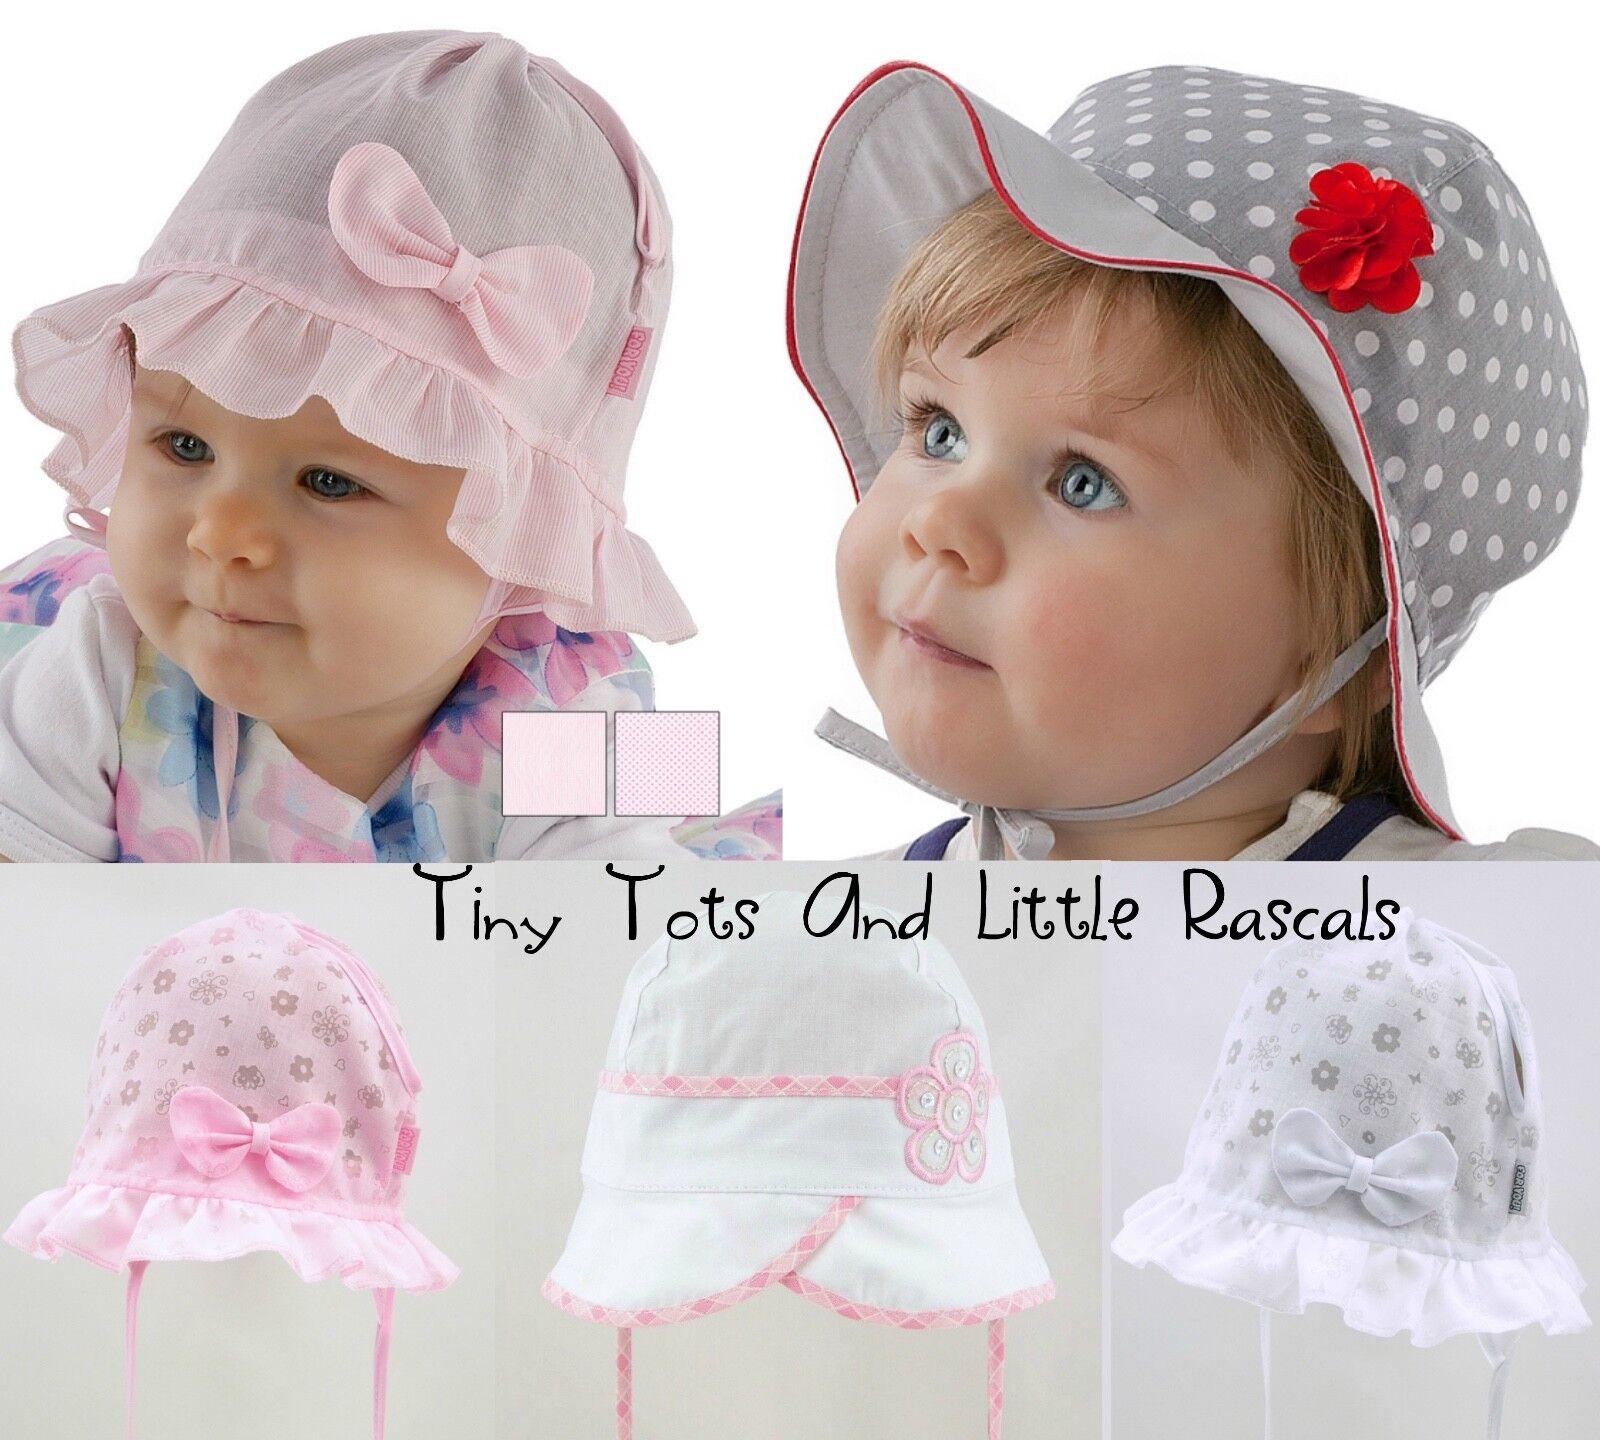 Baby Girl Toddler Soft Cotton Summer Sun Hat Cap Bonnet Outdoor Size 0 - 8 years